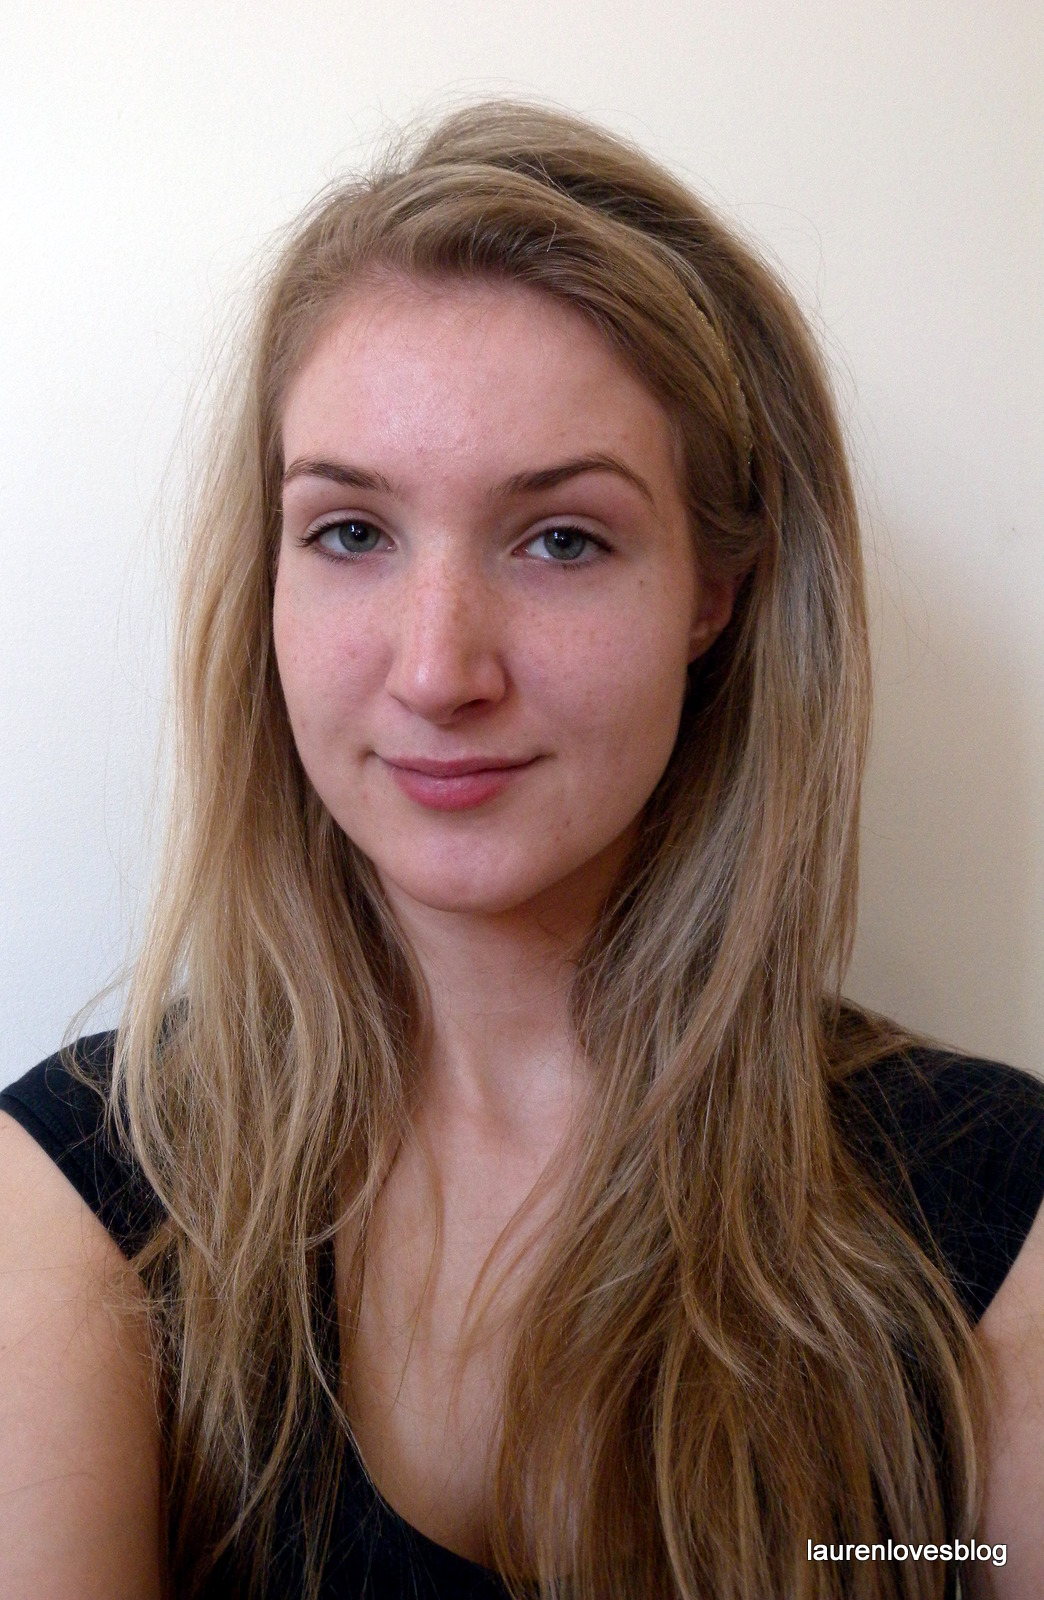 Laurenlovesmakeup Xoxo Primark Pound Fashion Nails: My Summer Makeup Routine